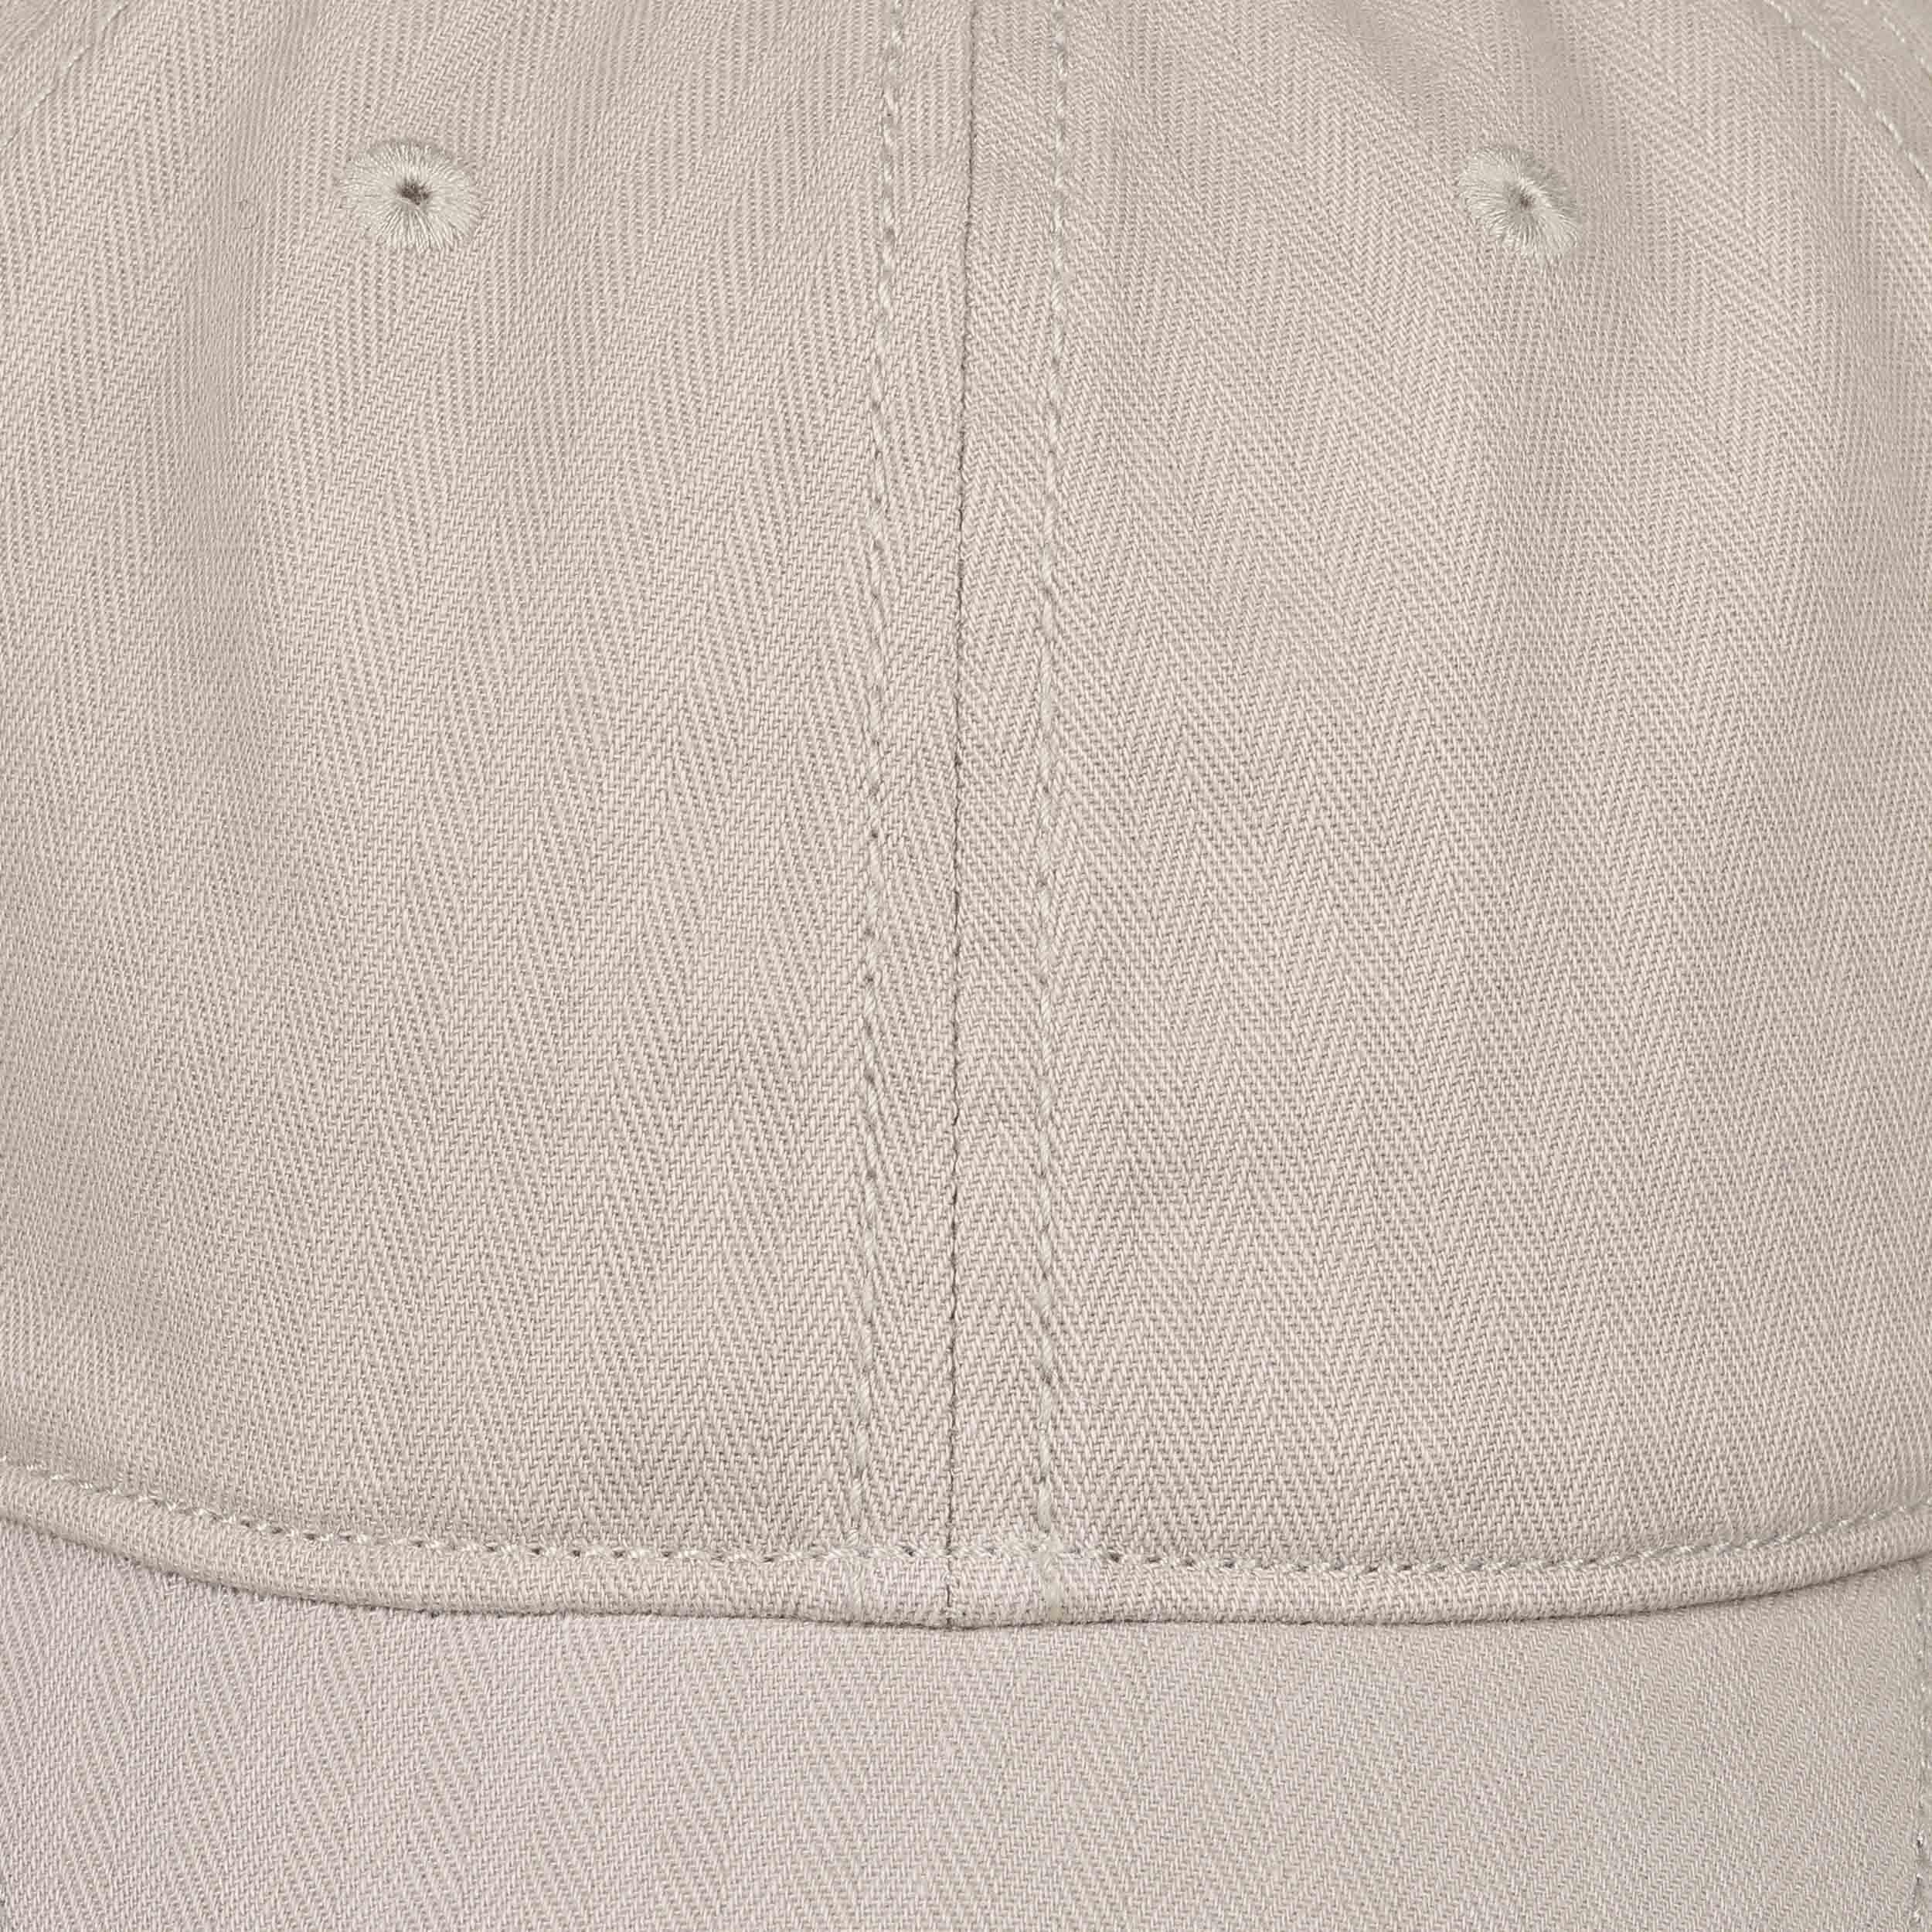 344c52333eb ... Marshal Cotton Baseball Cap by Stetson - beige-blue 4 ...